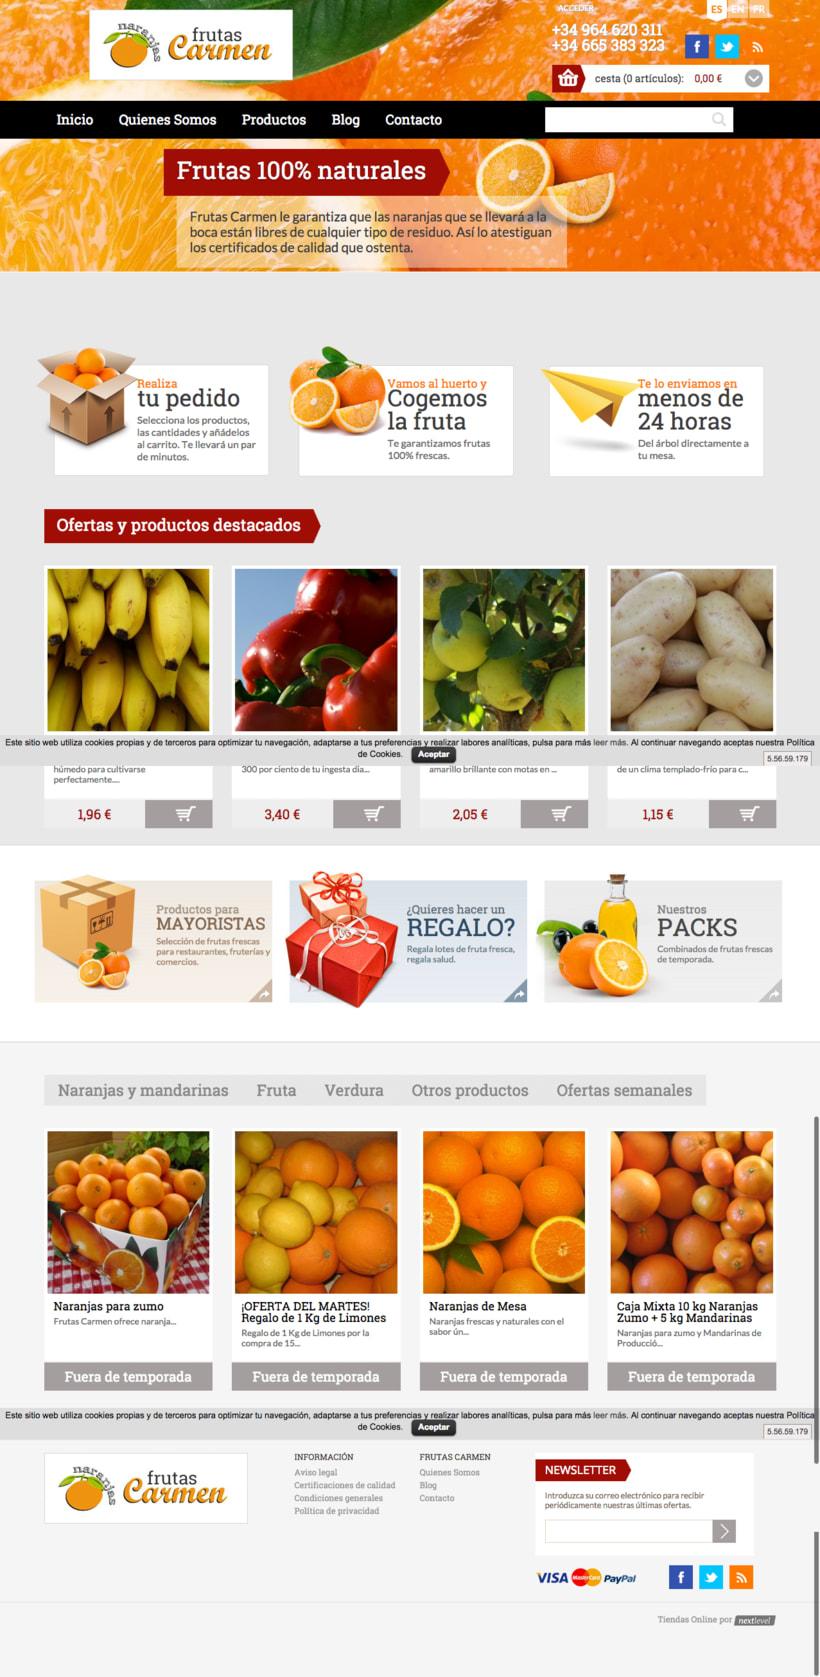 Tienda online frutascarmen.com -1